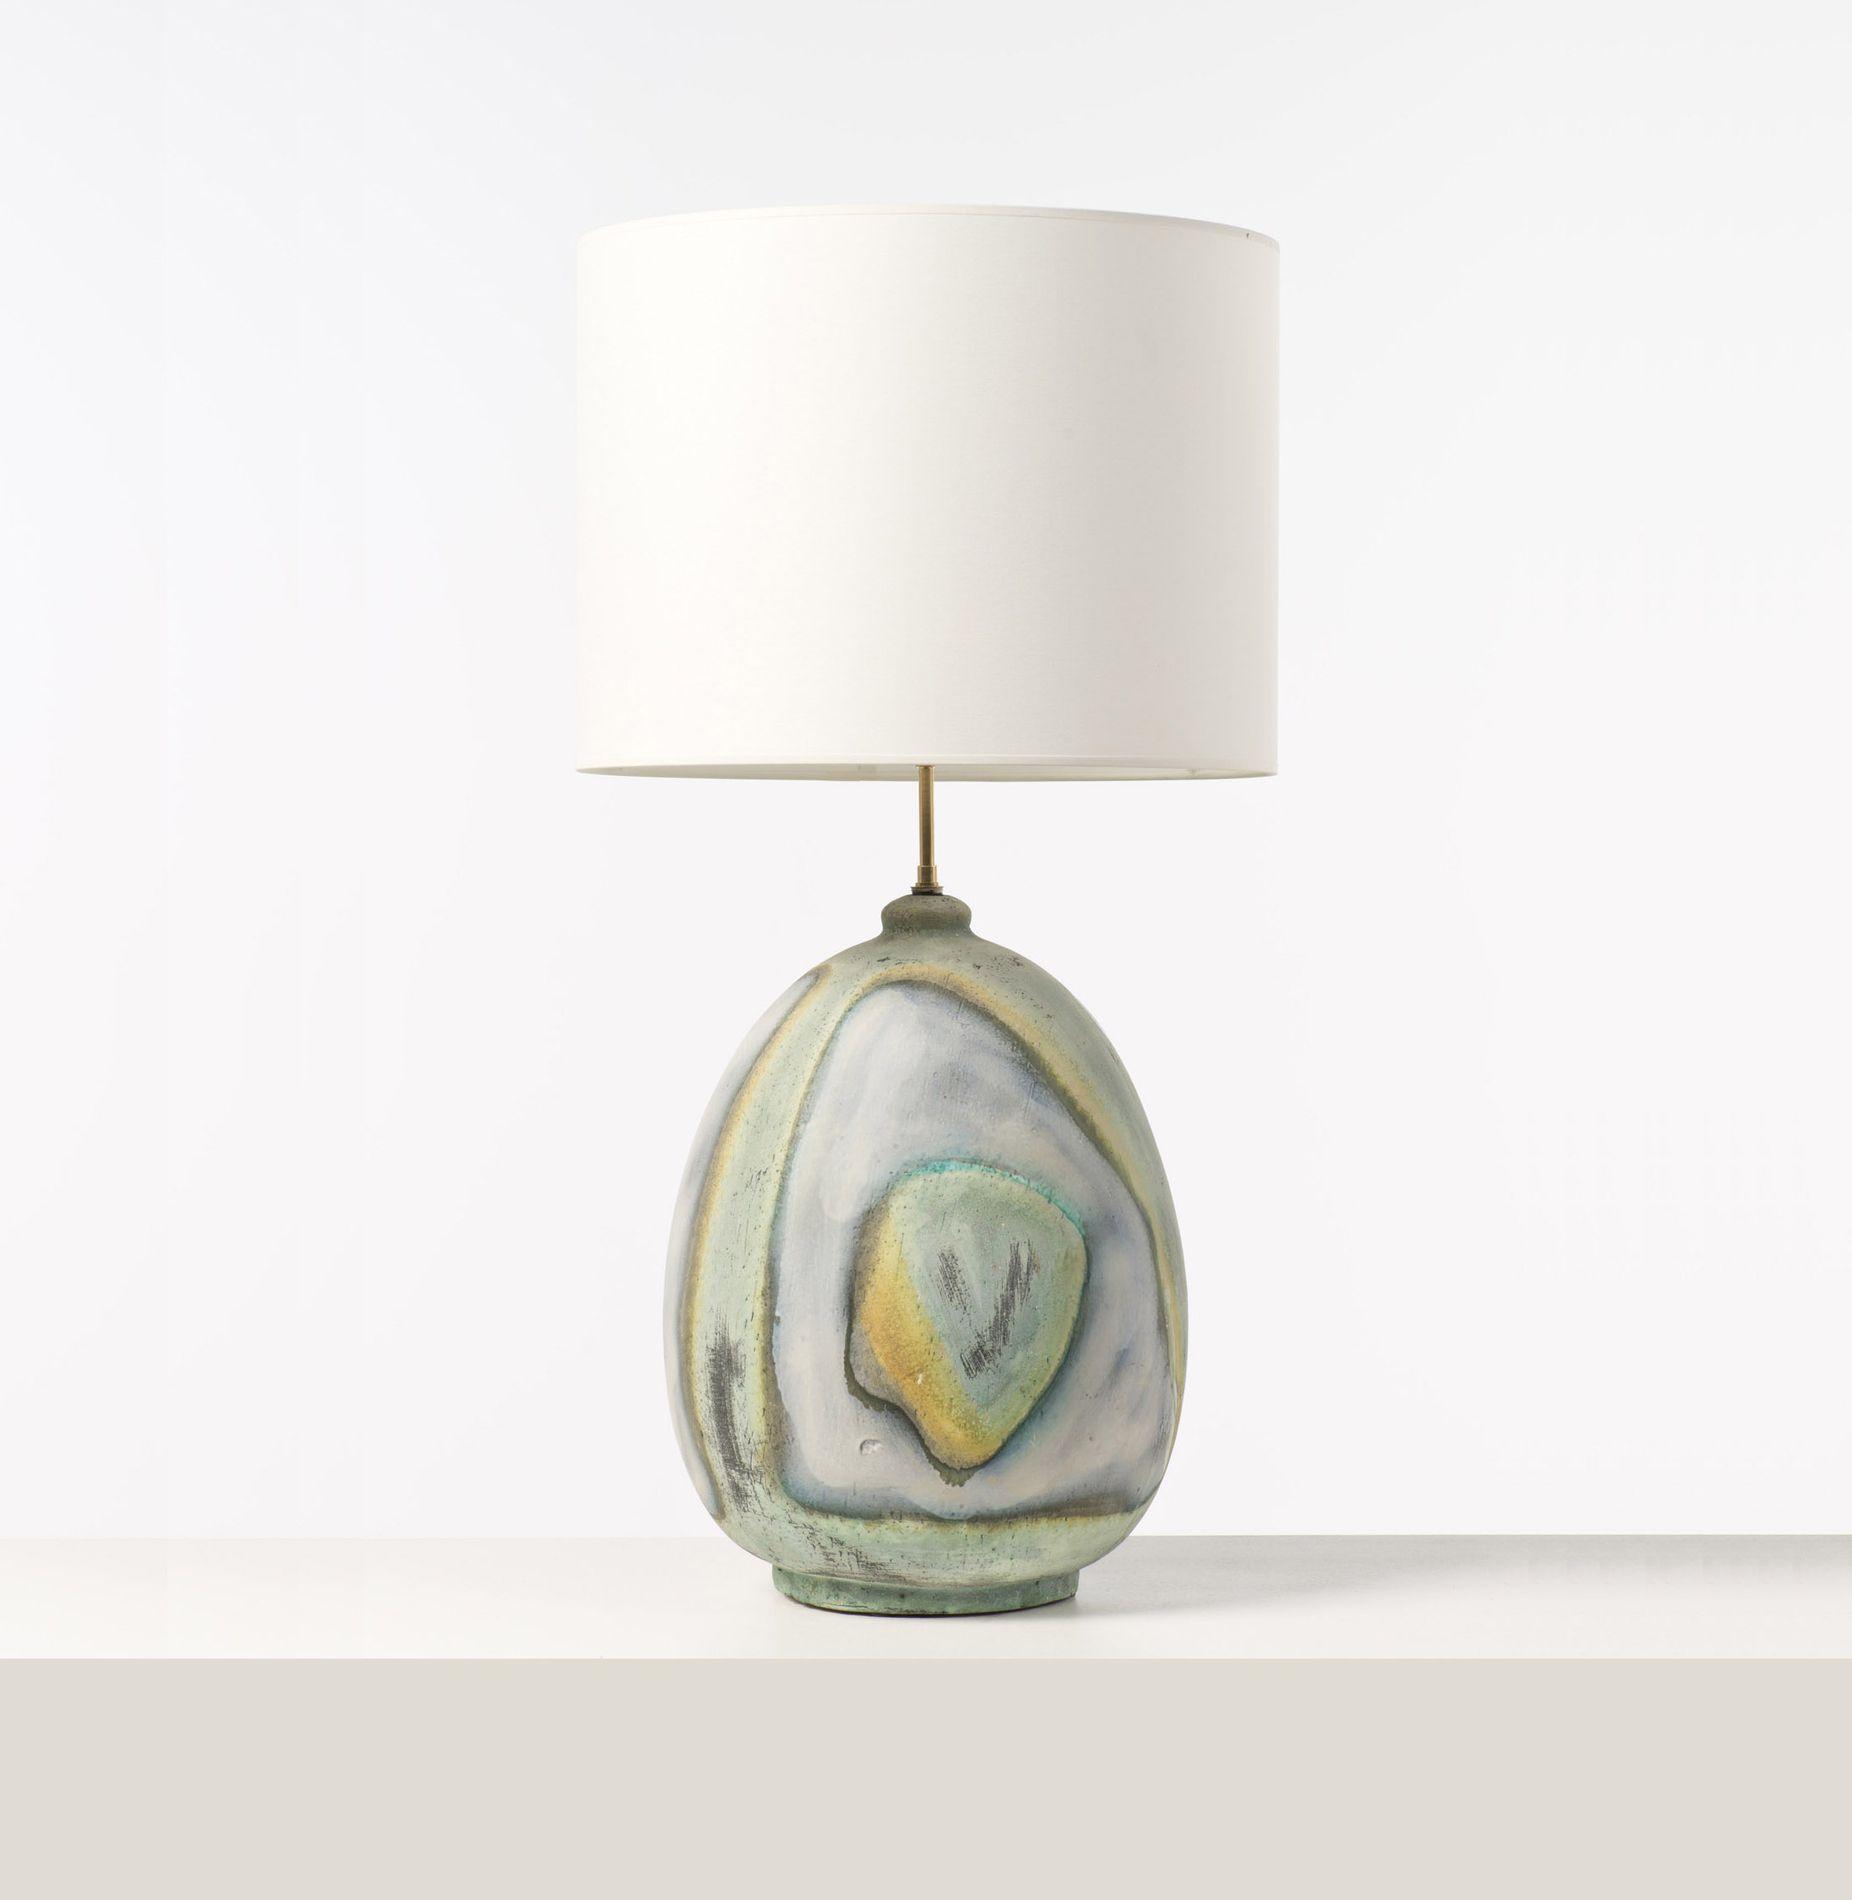 Marcello fantoni glazed ceramic table lamp c1955 for Mini table de nuit